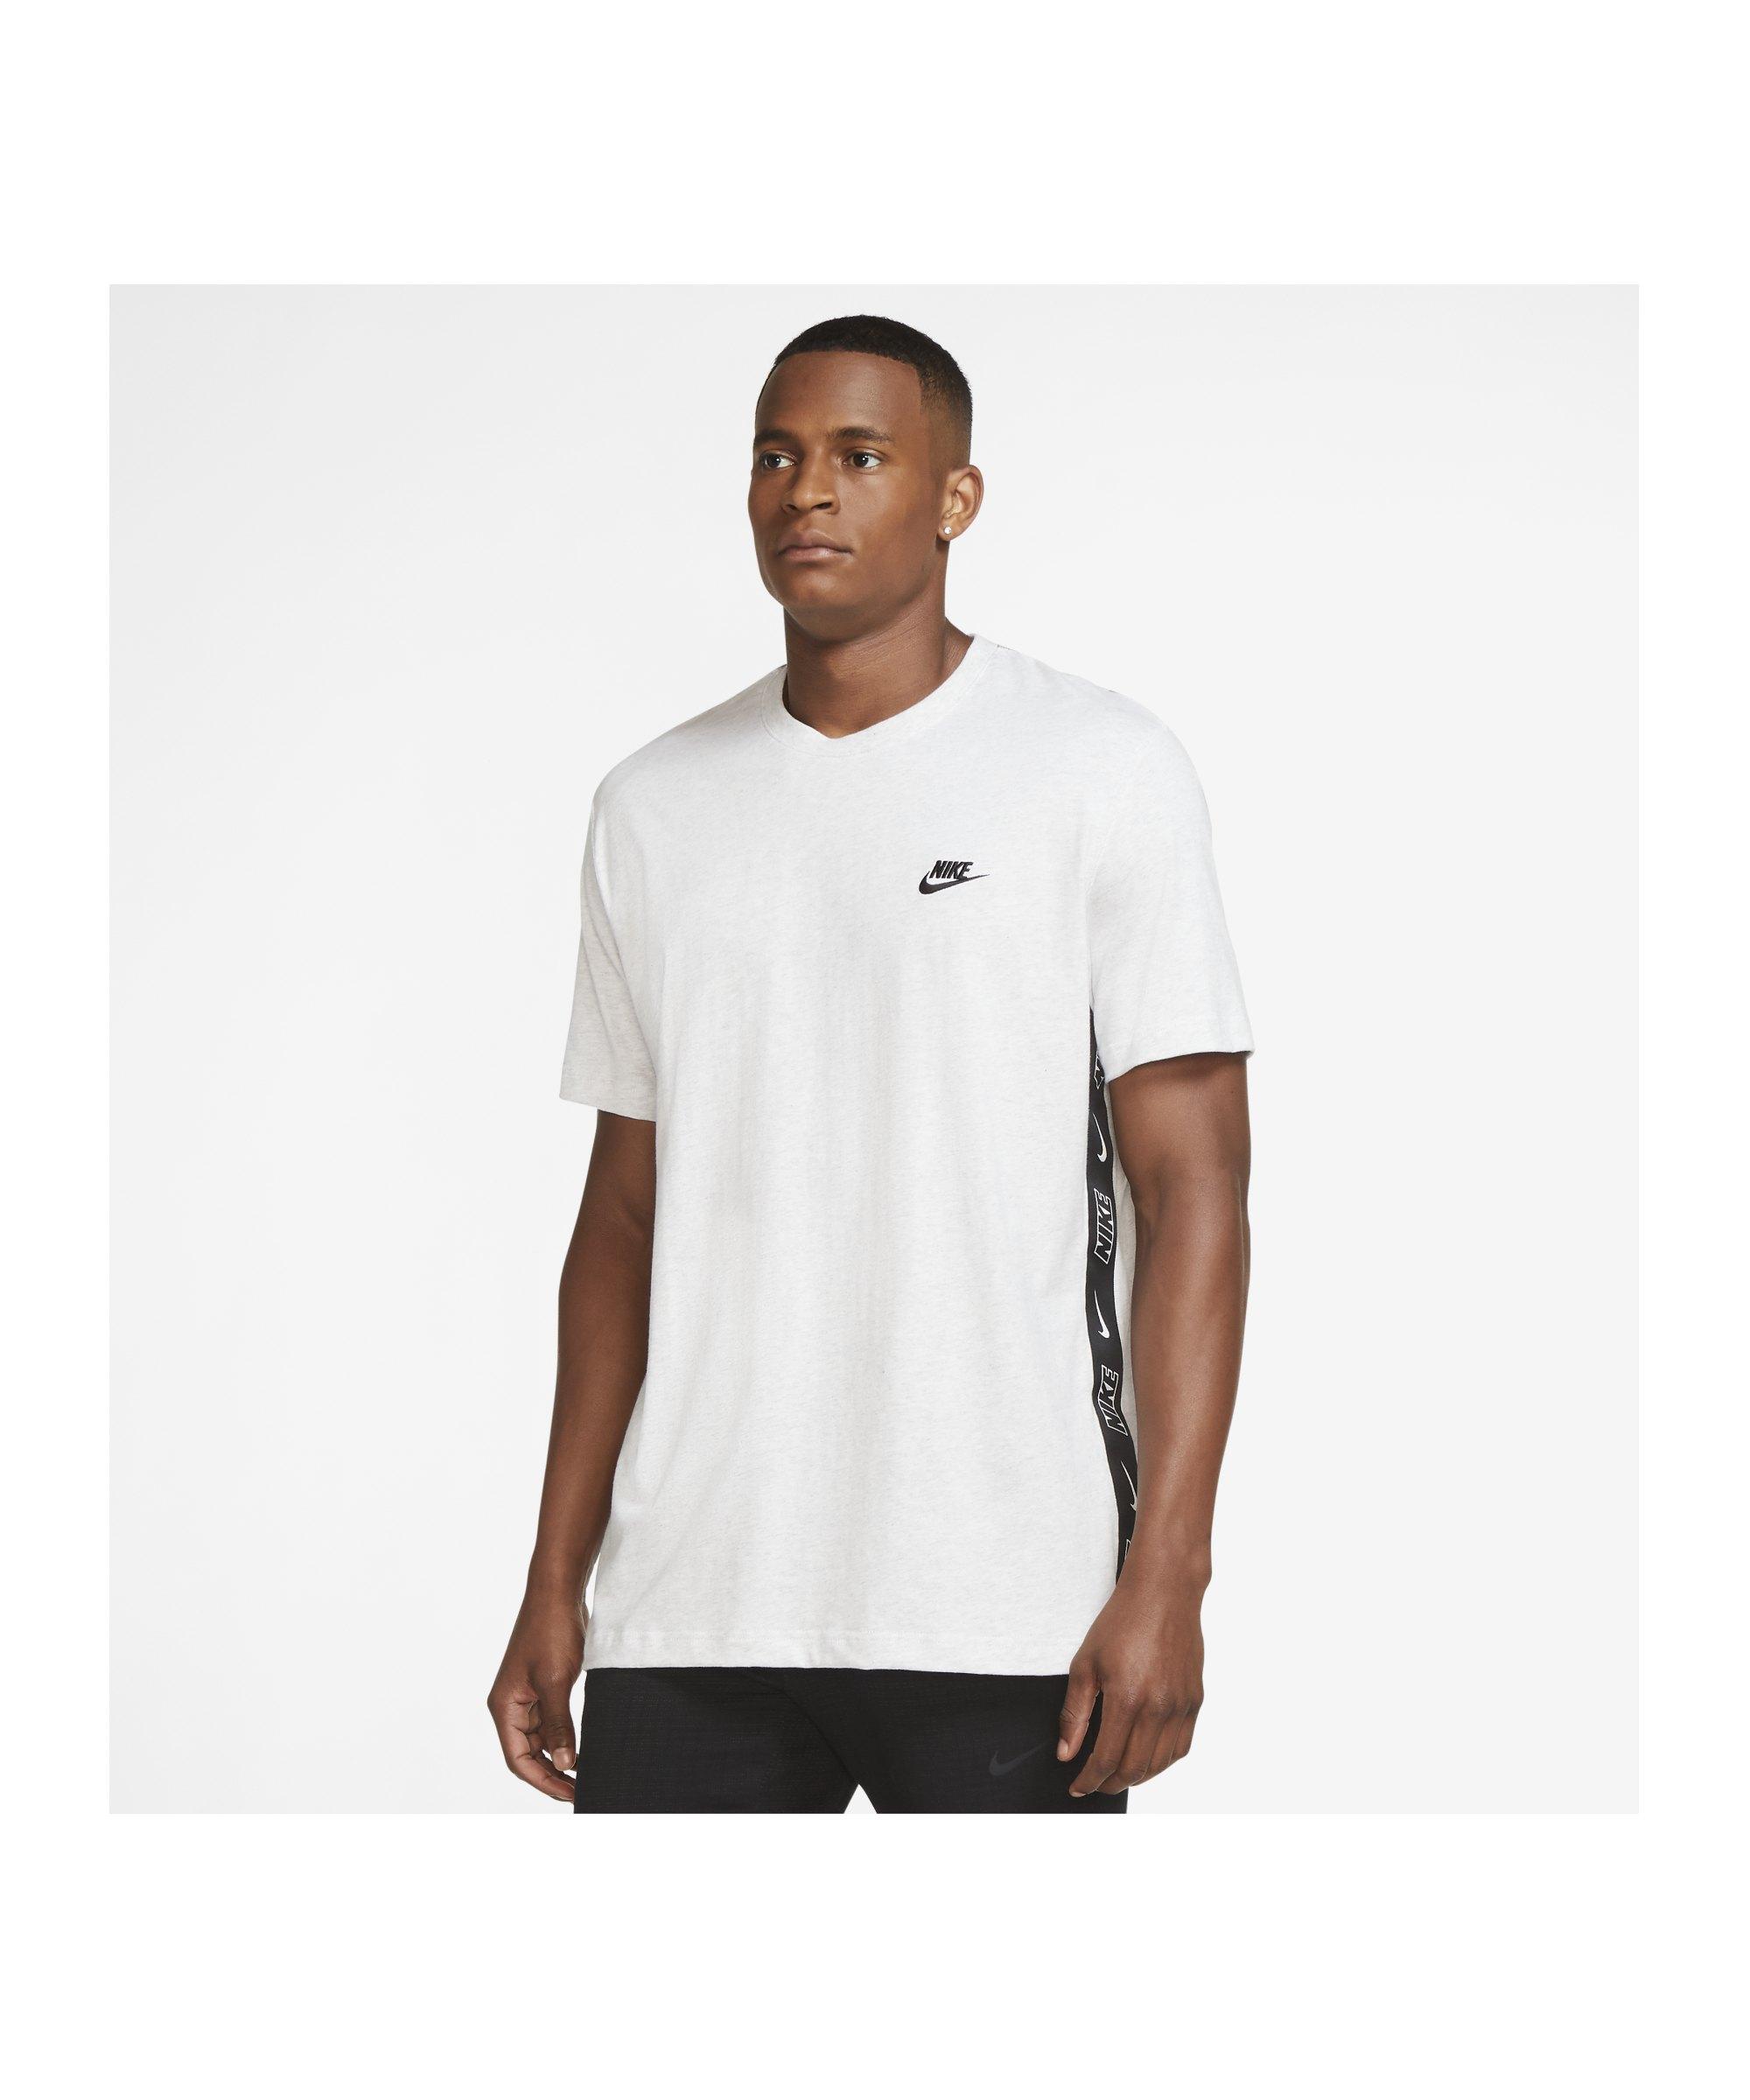 Nike Knit T-Shirt Weiss F051 - grau